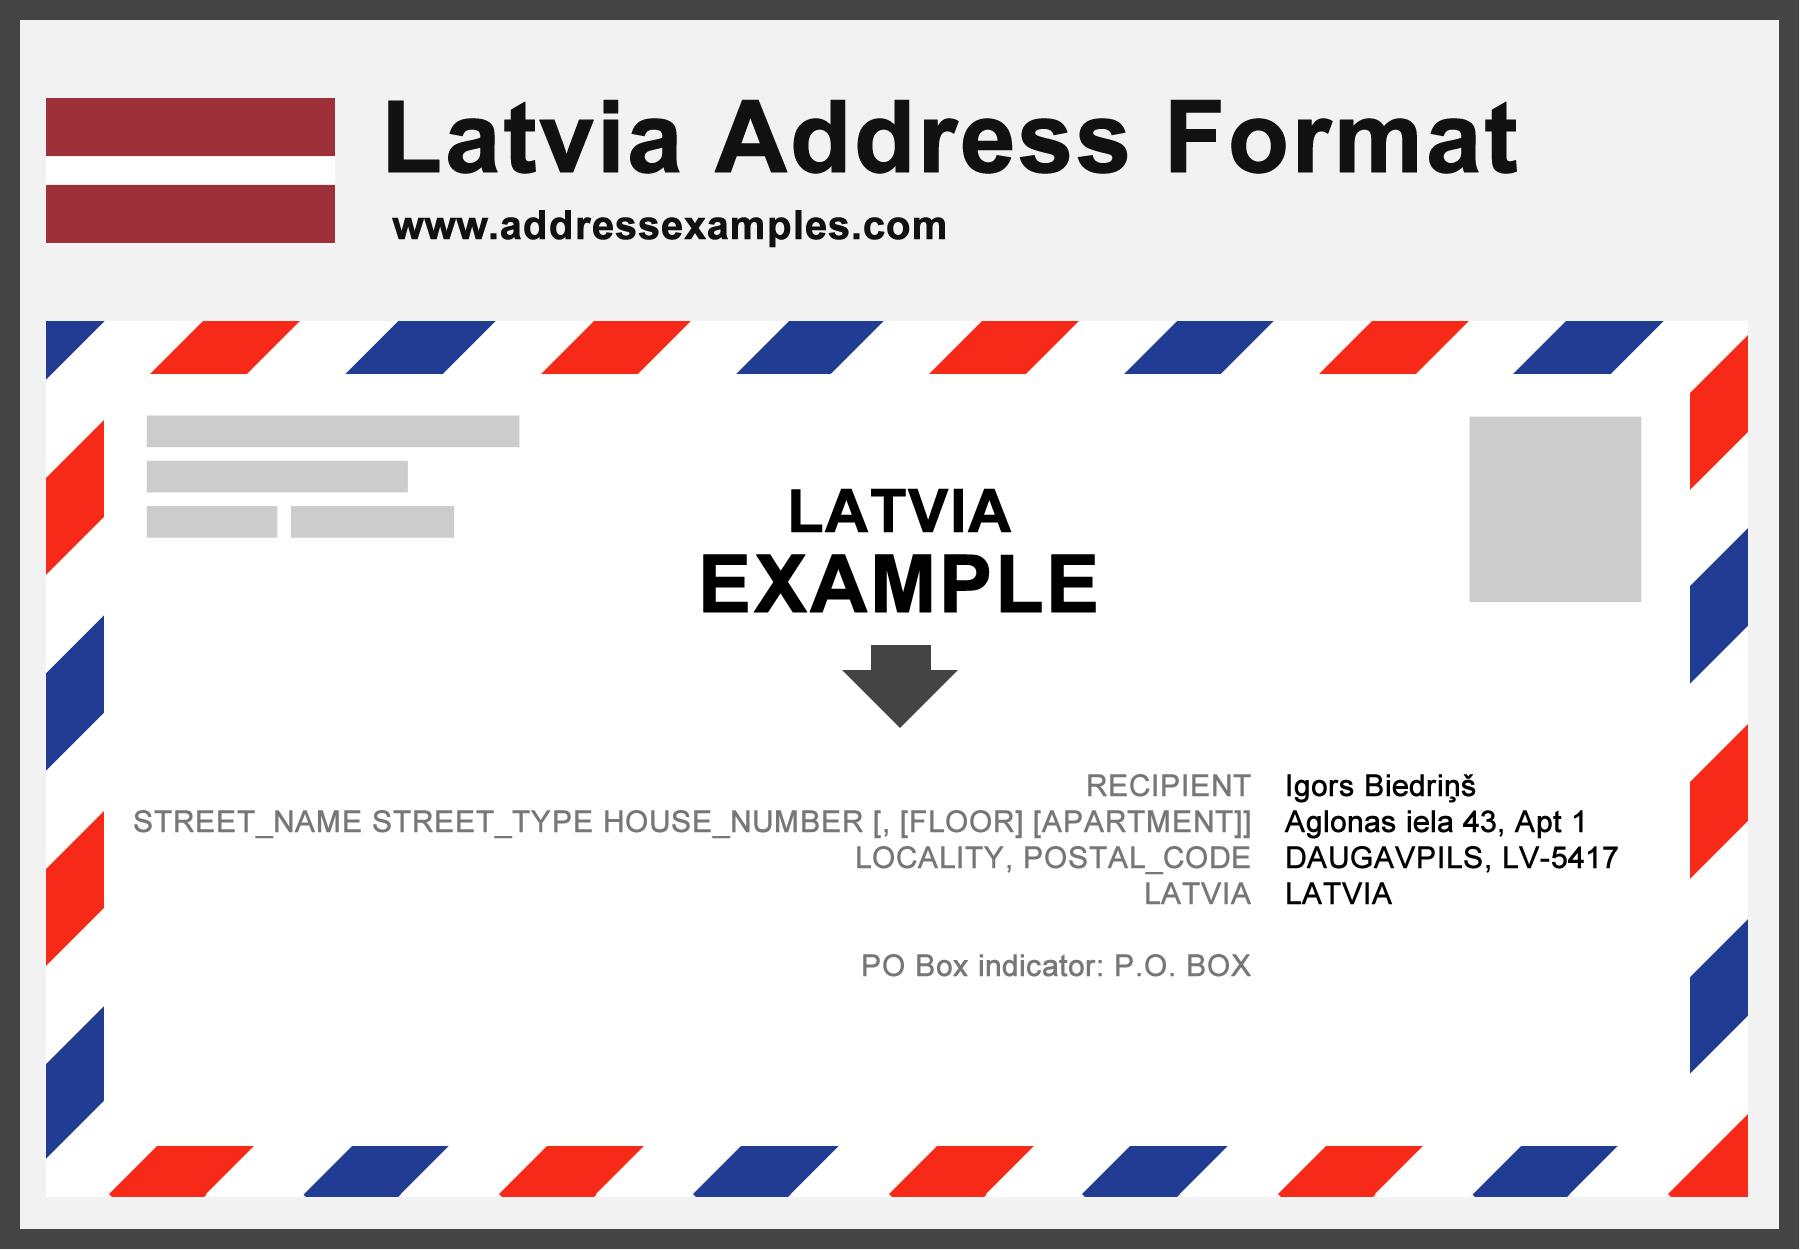 latvia address format addressexamples com